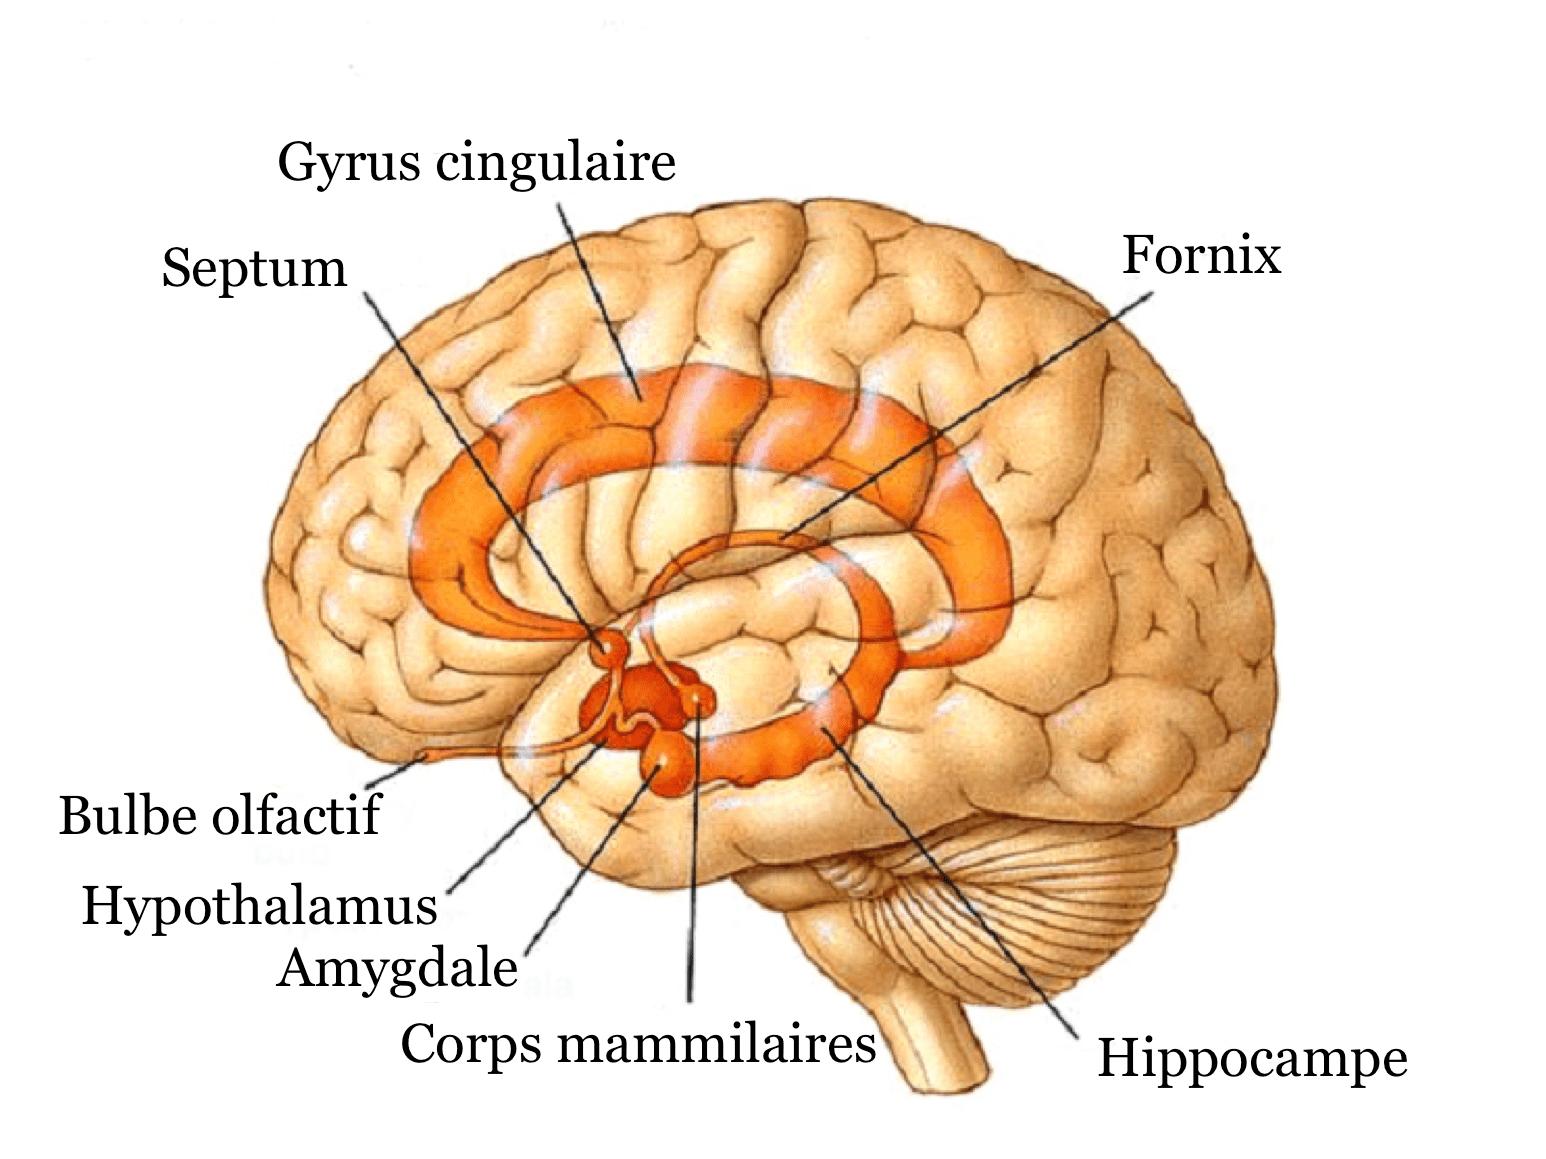 Systeme_limbique_1 - neuromedia.ca